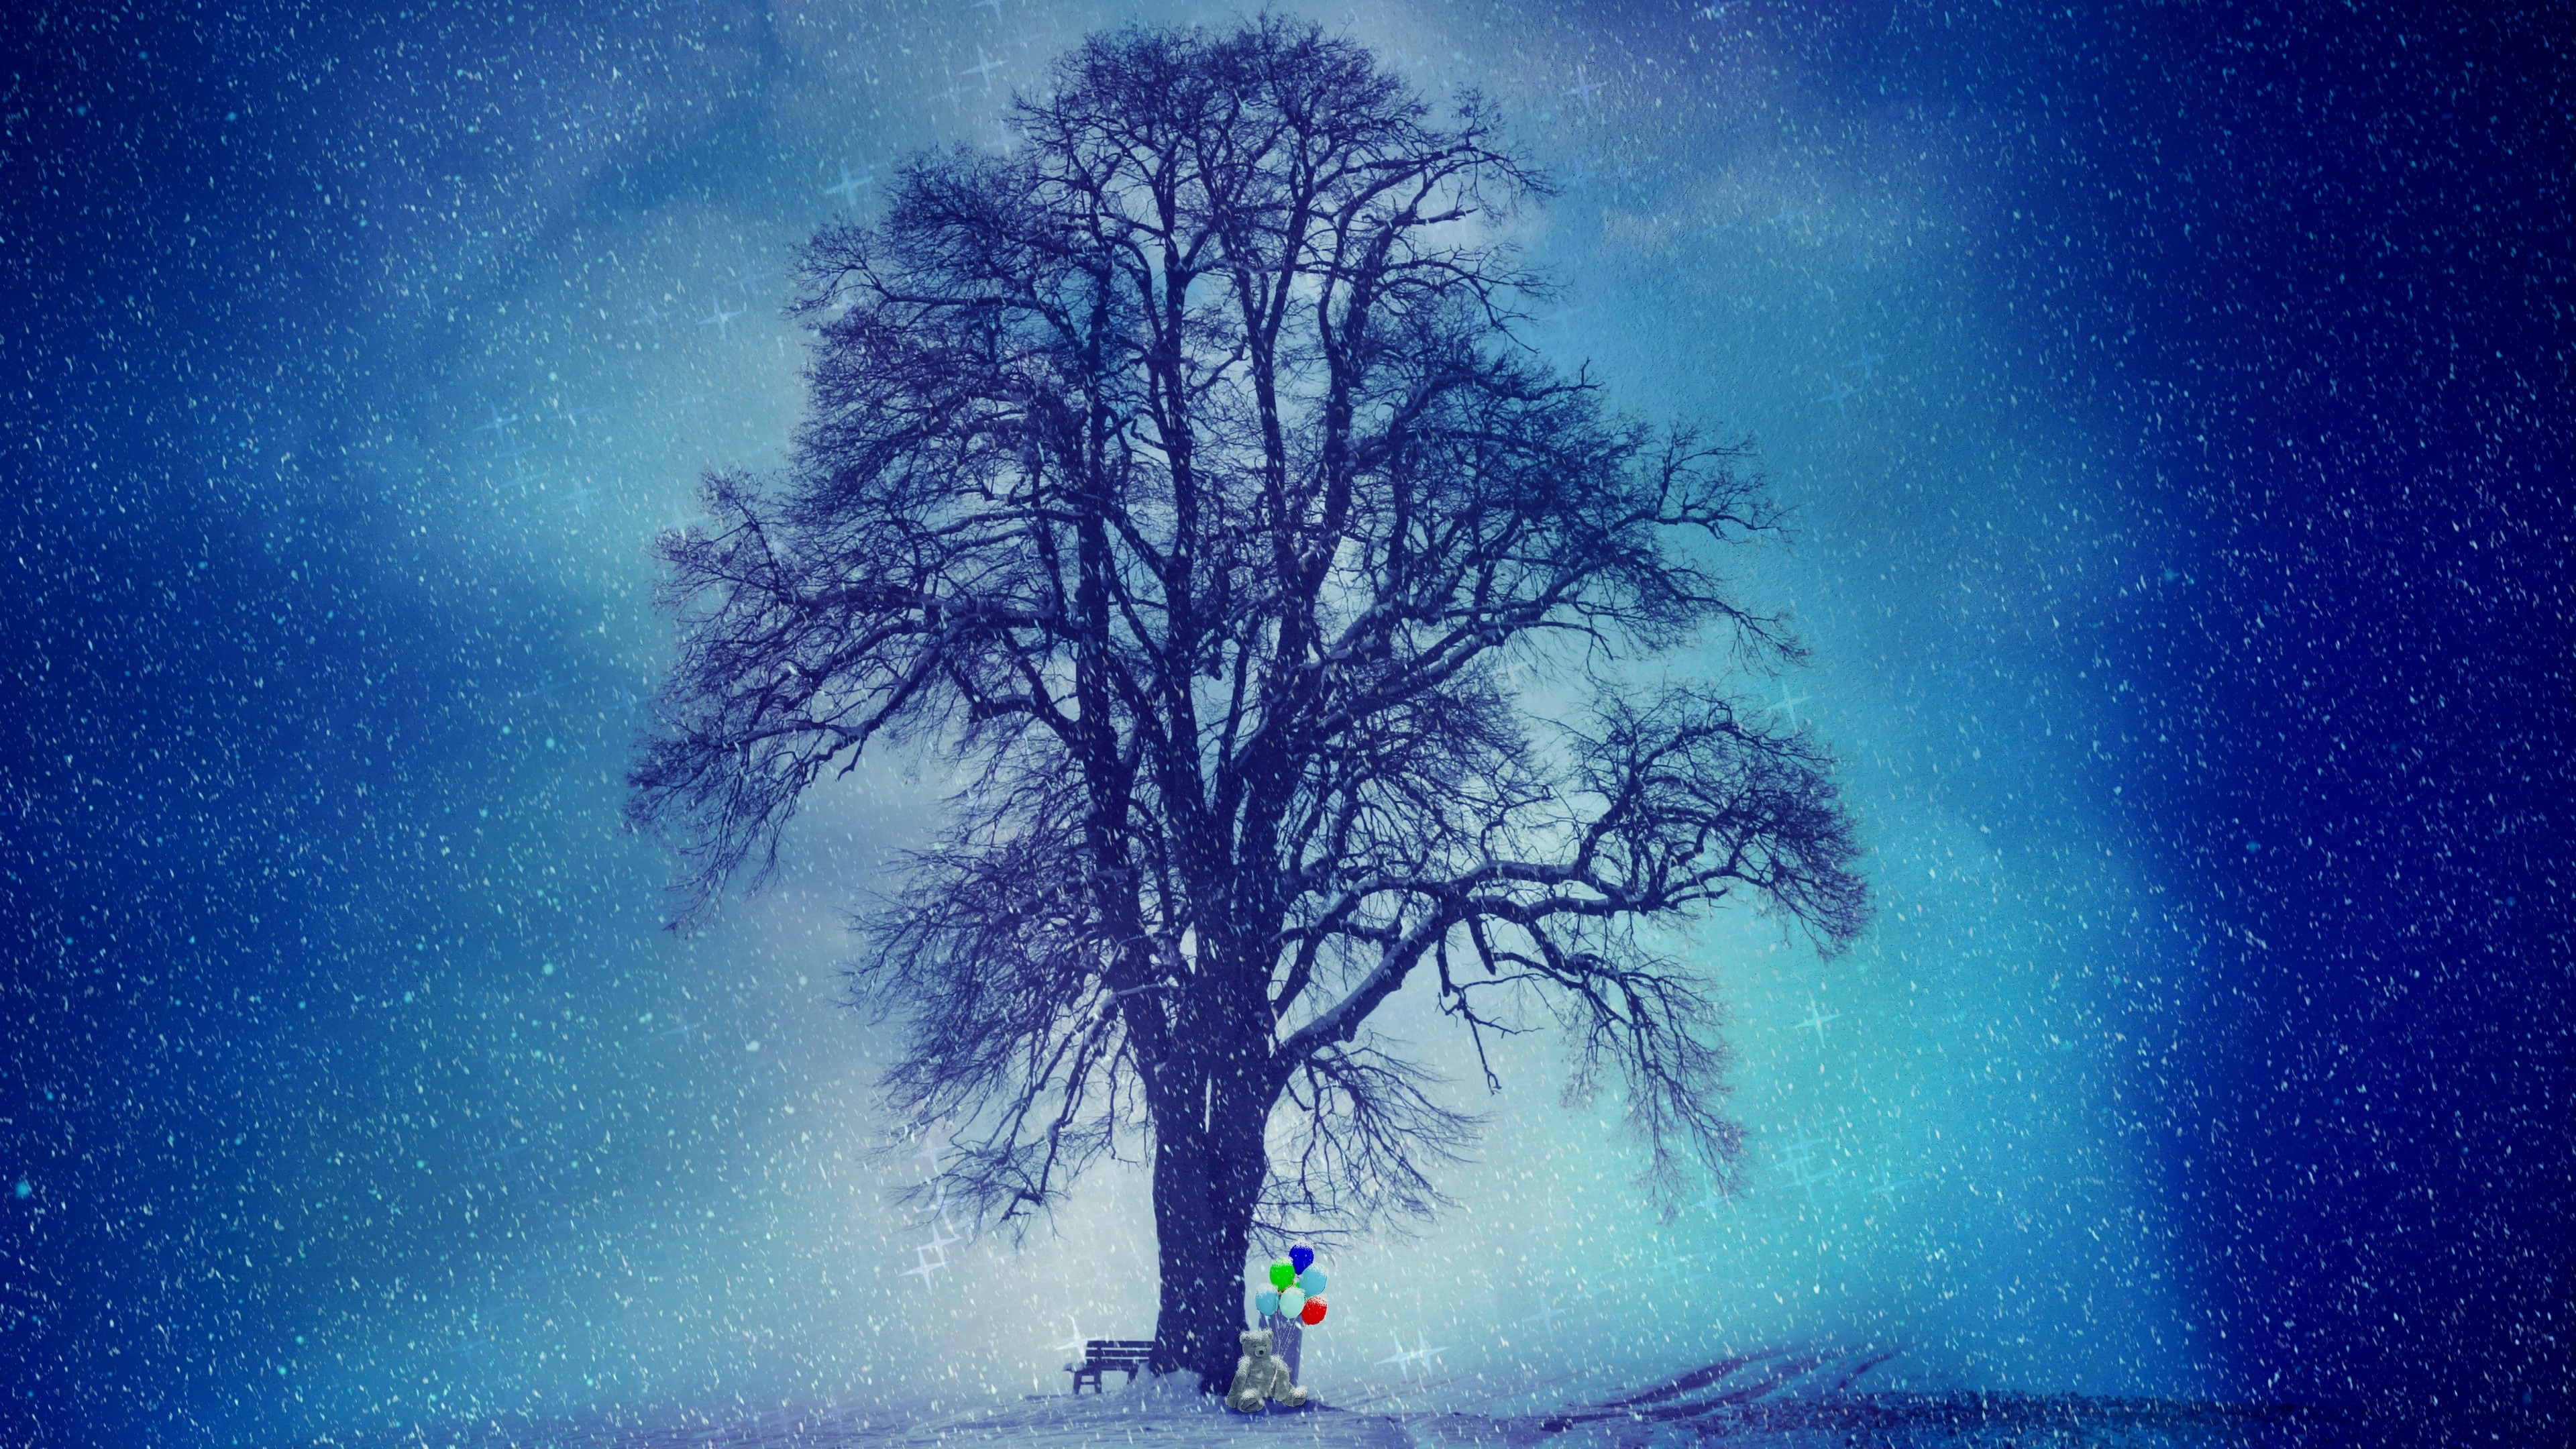 winter snow cold tree 4k 1540134408 - Winter Snow Cold Tree 4k - winter wallpapers, tree wallpapers, snow wallpapers, hd-wallpapers, cold wallpapers, 5k wallpapers, 4k-wallpapers